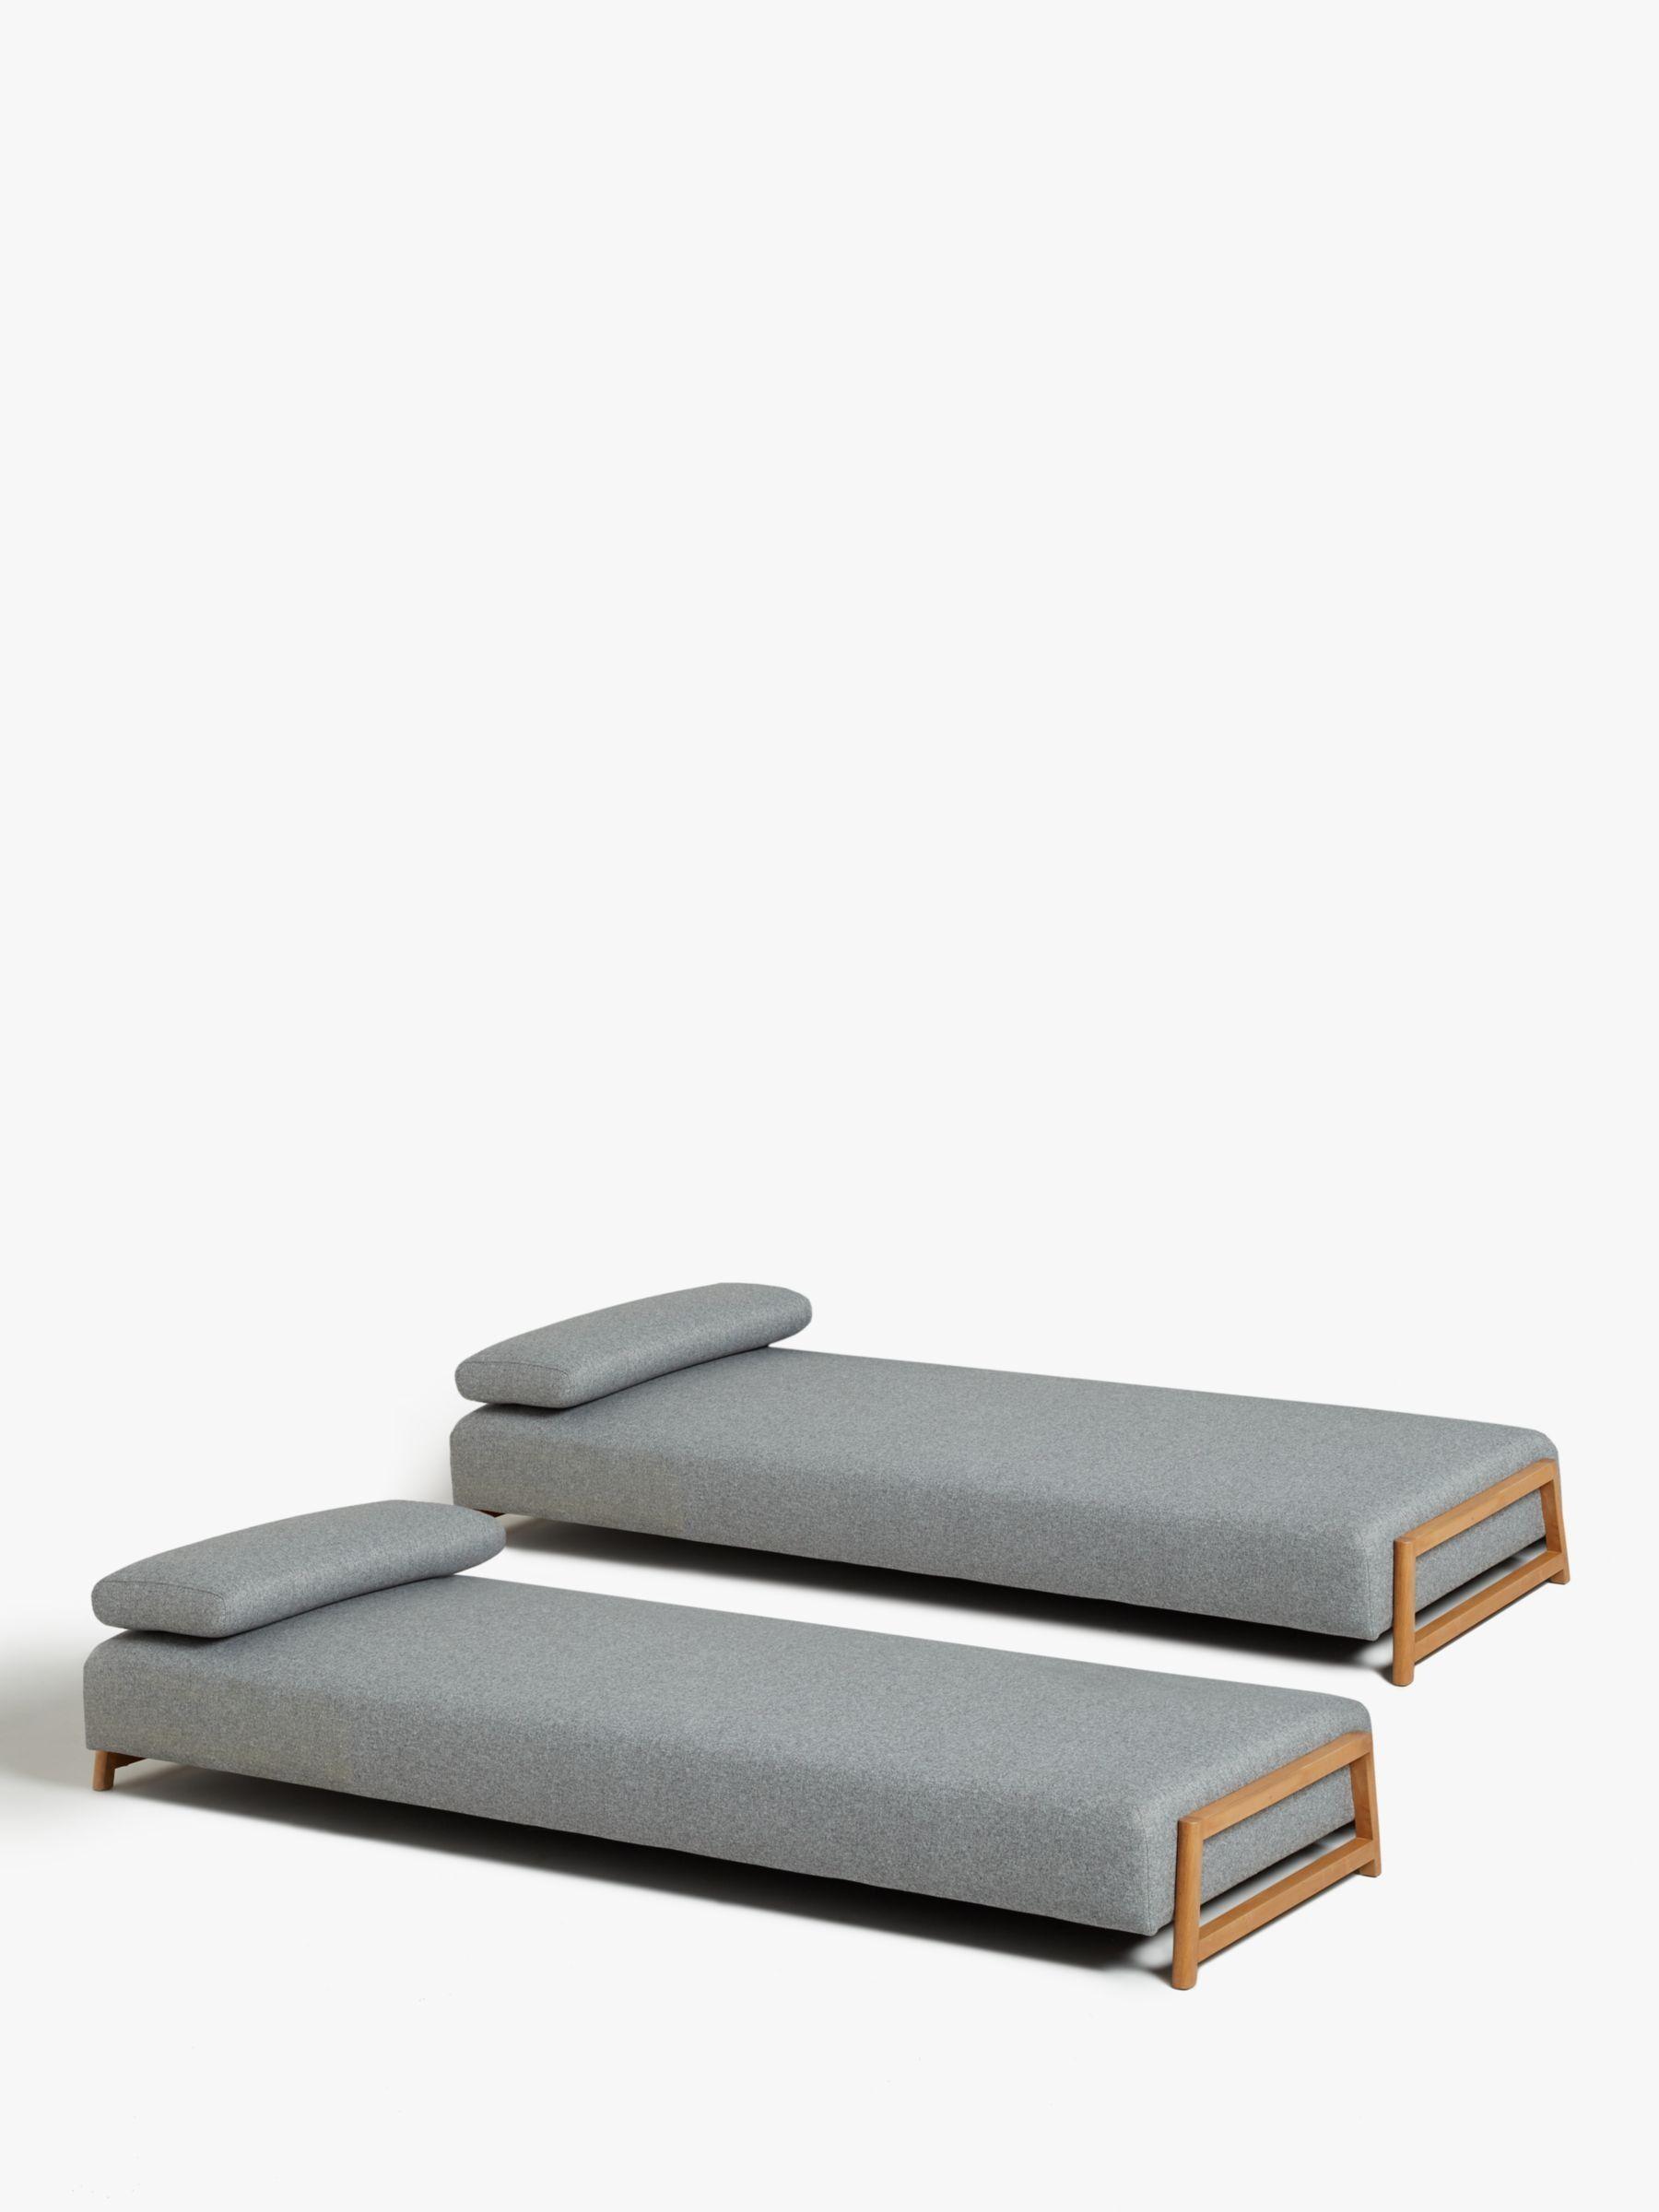 - John Lewis & Partners Duplet Daybed King Size Bed Designs